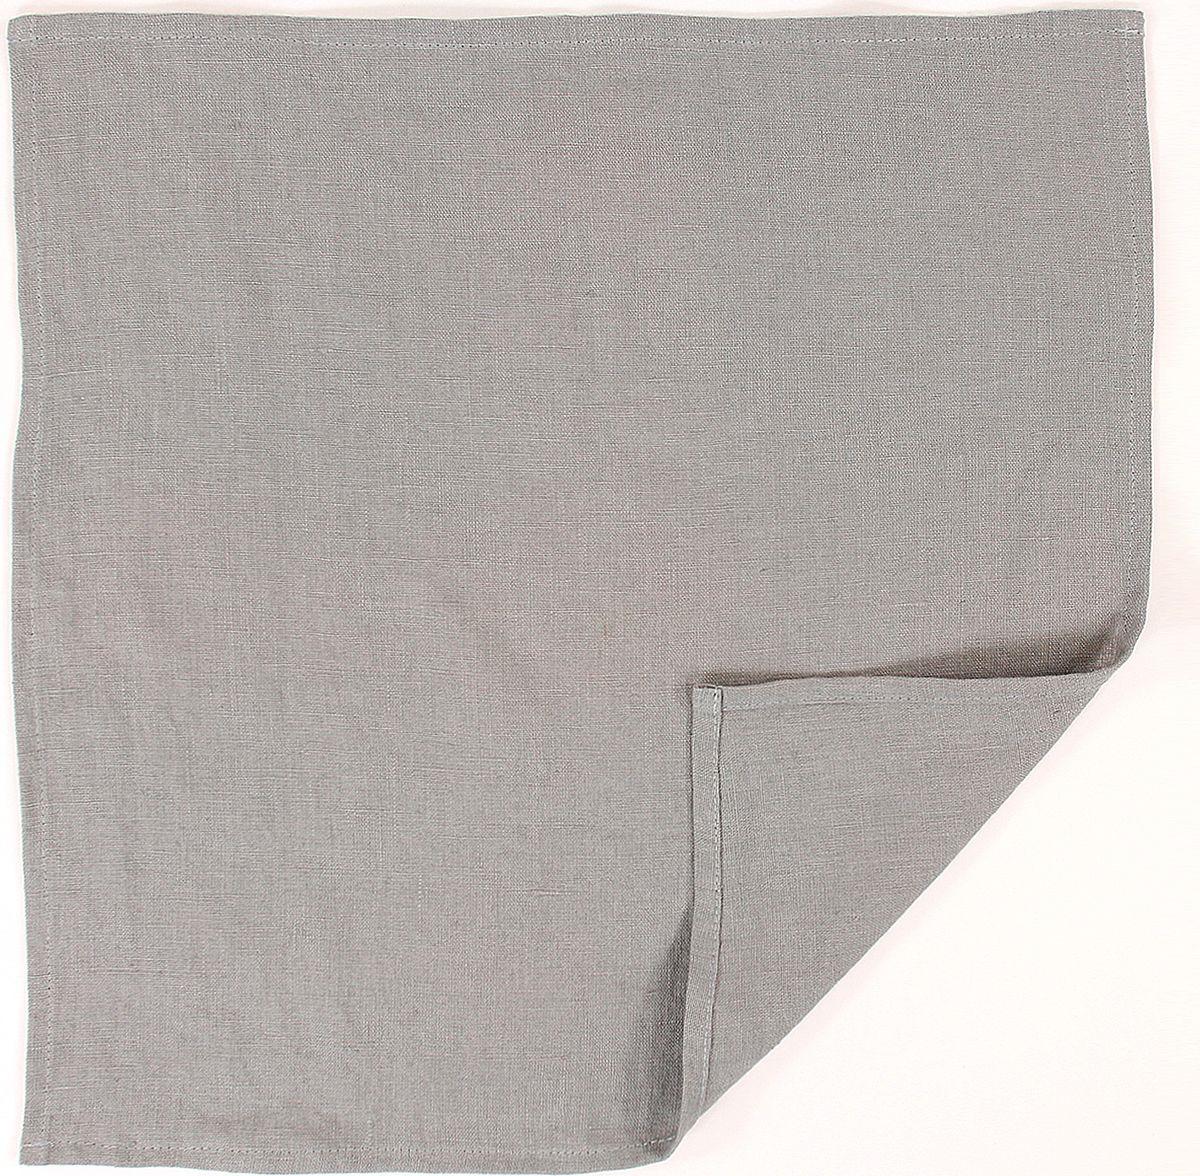 Салфетка столовая Tkano Essential, TK18-NA0009, серый, 45 x 45 см